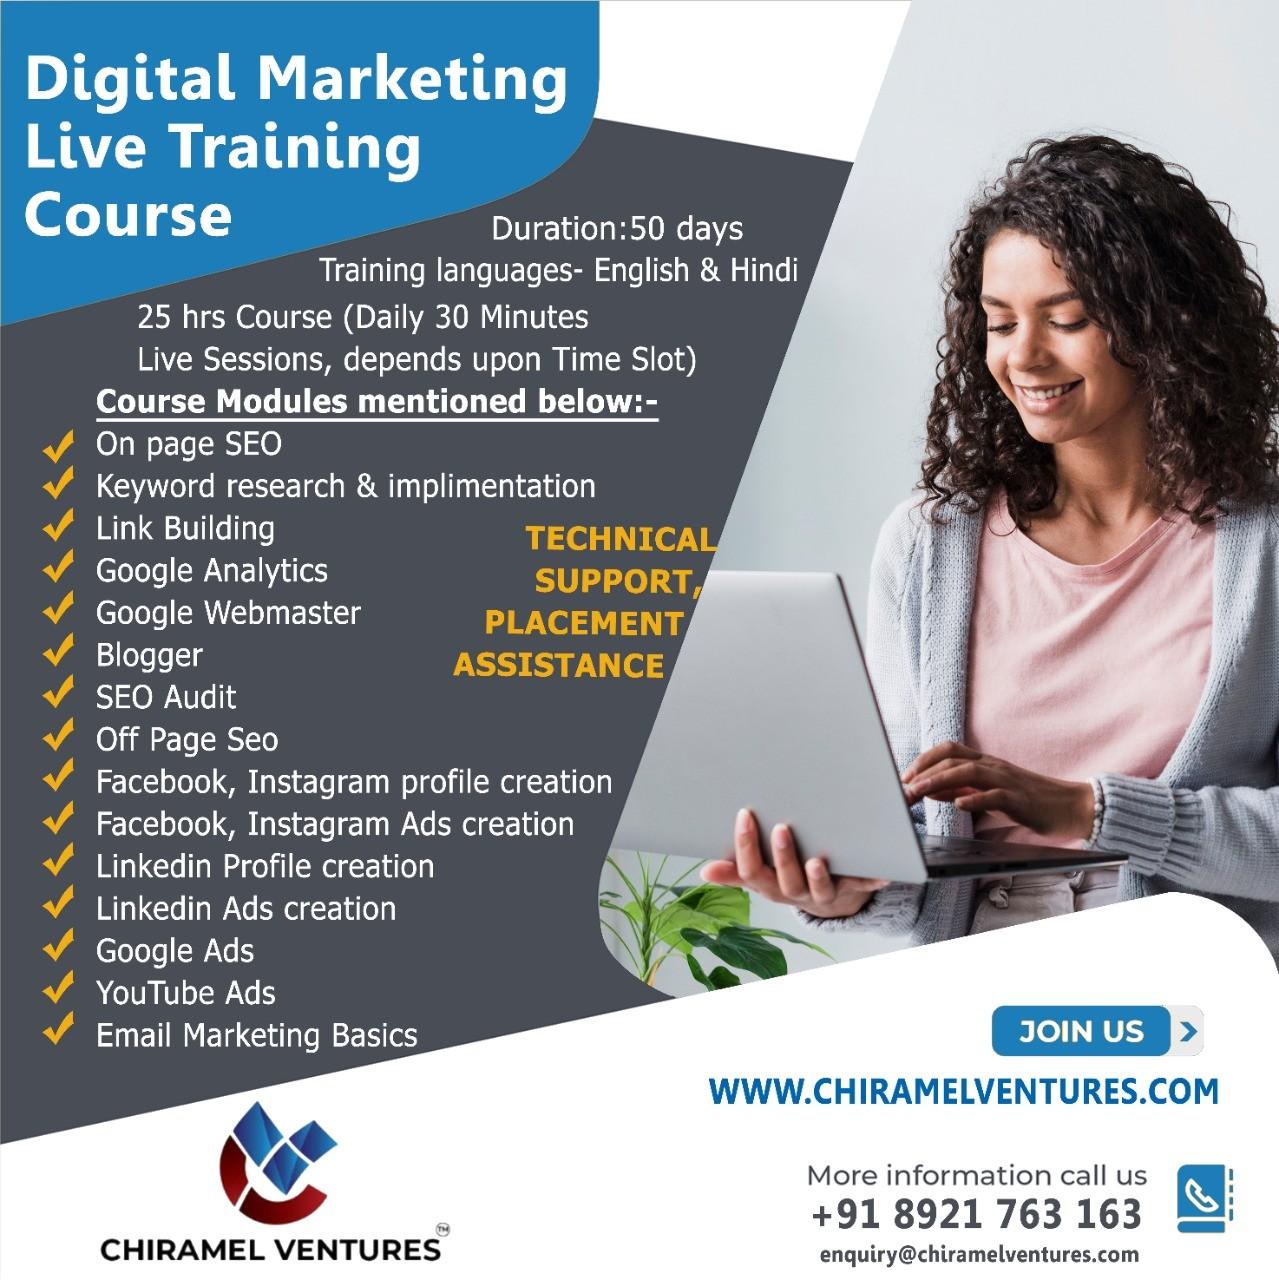 Digital Marketing Live Training - Chiramelventures